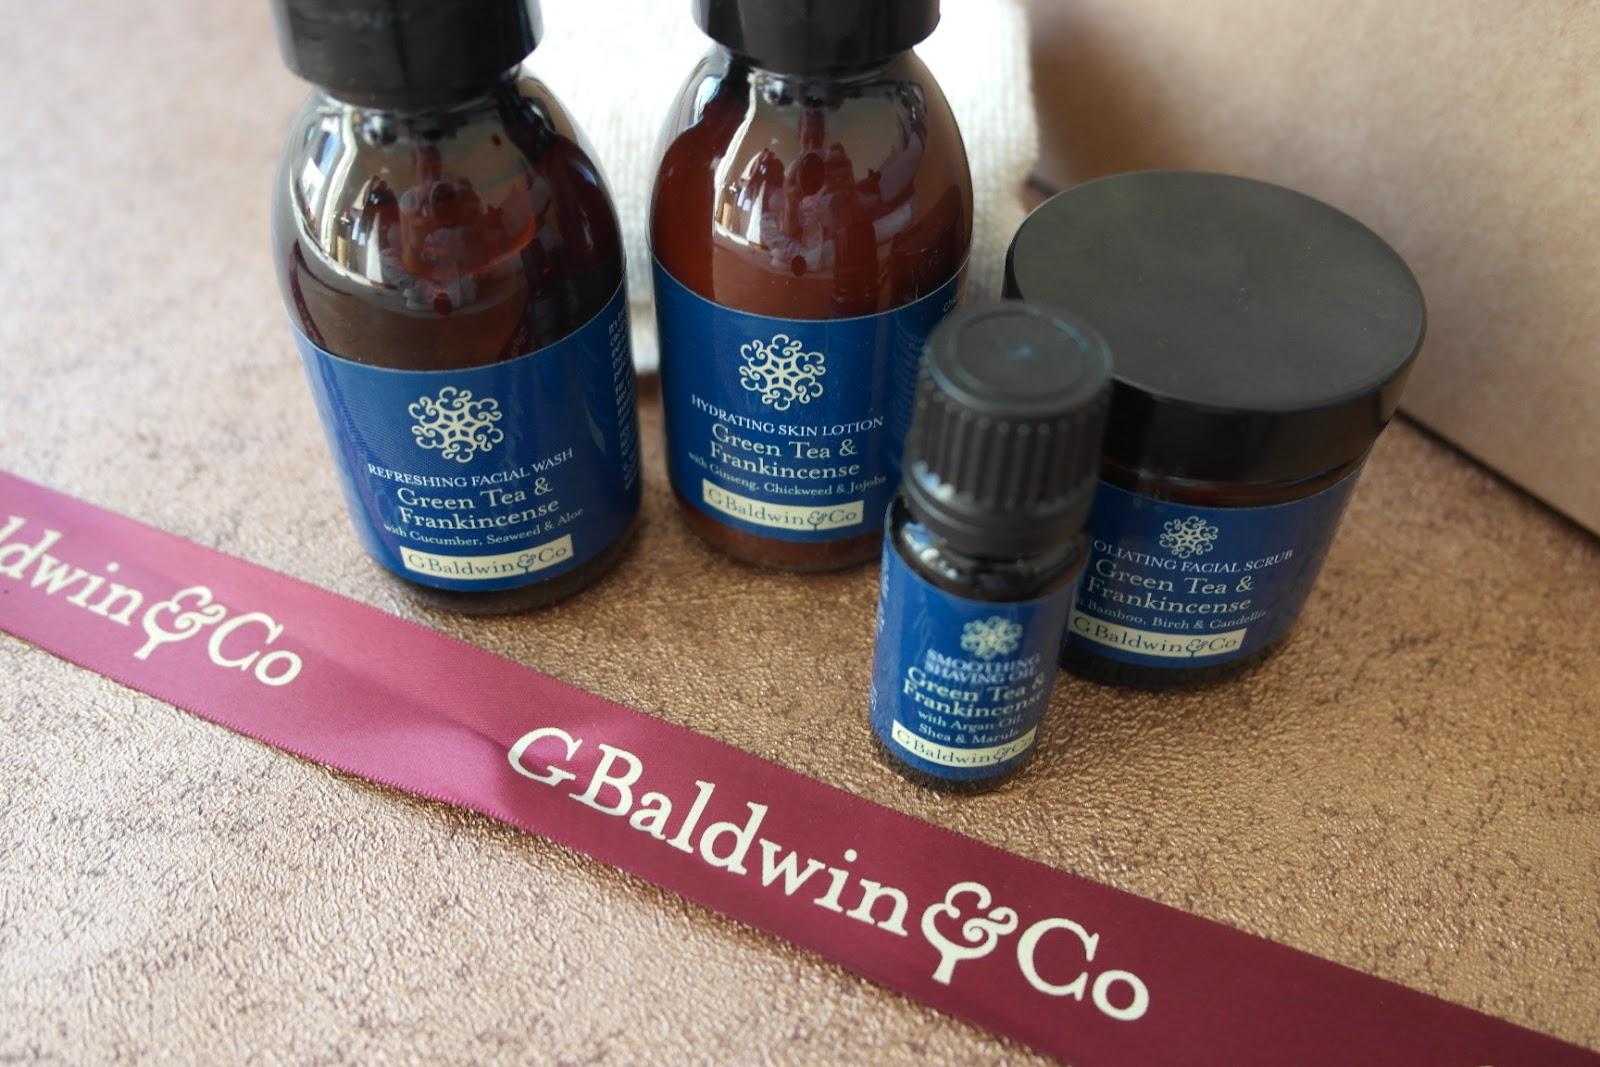 G Baldwin & Co Men's green tea & frankincense gift set review